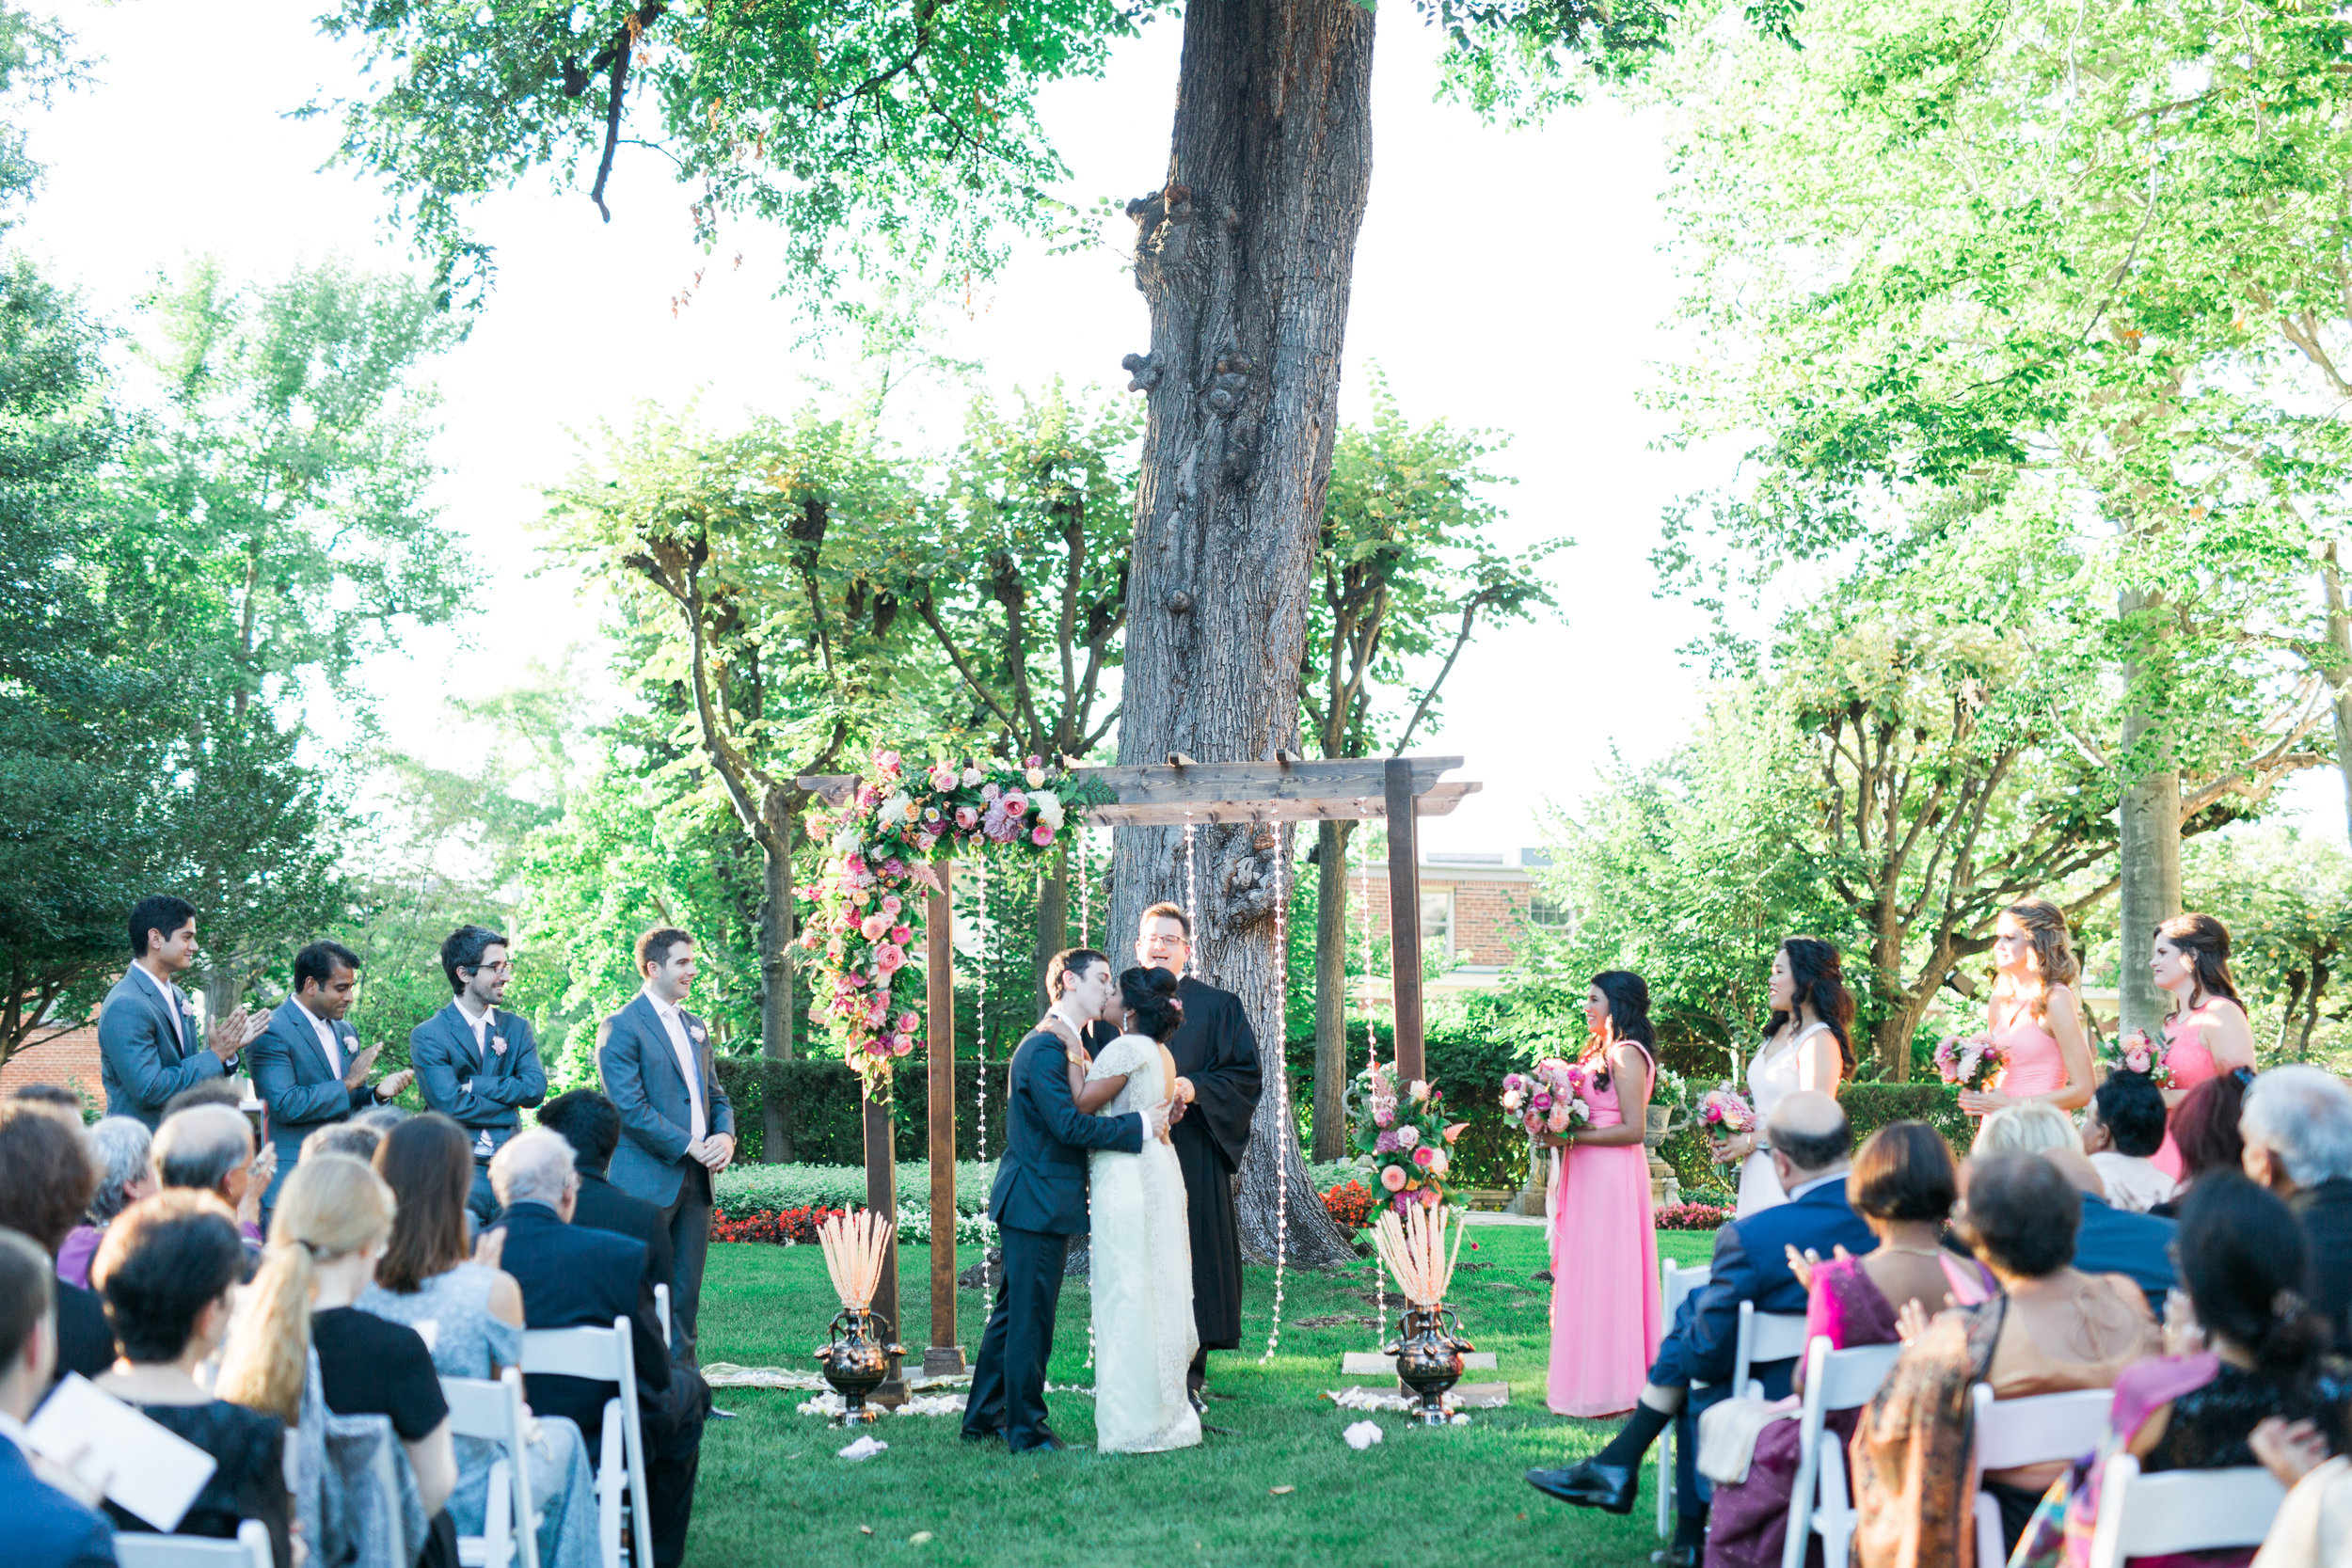 catherineannphotography-wedding-92317-sitaragordon-0547.jpg